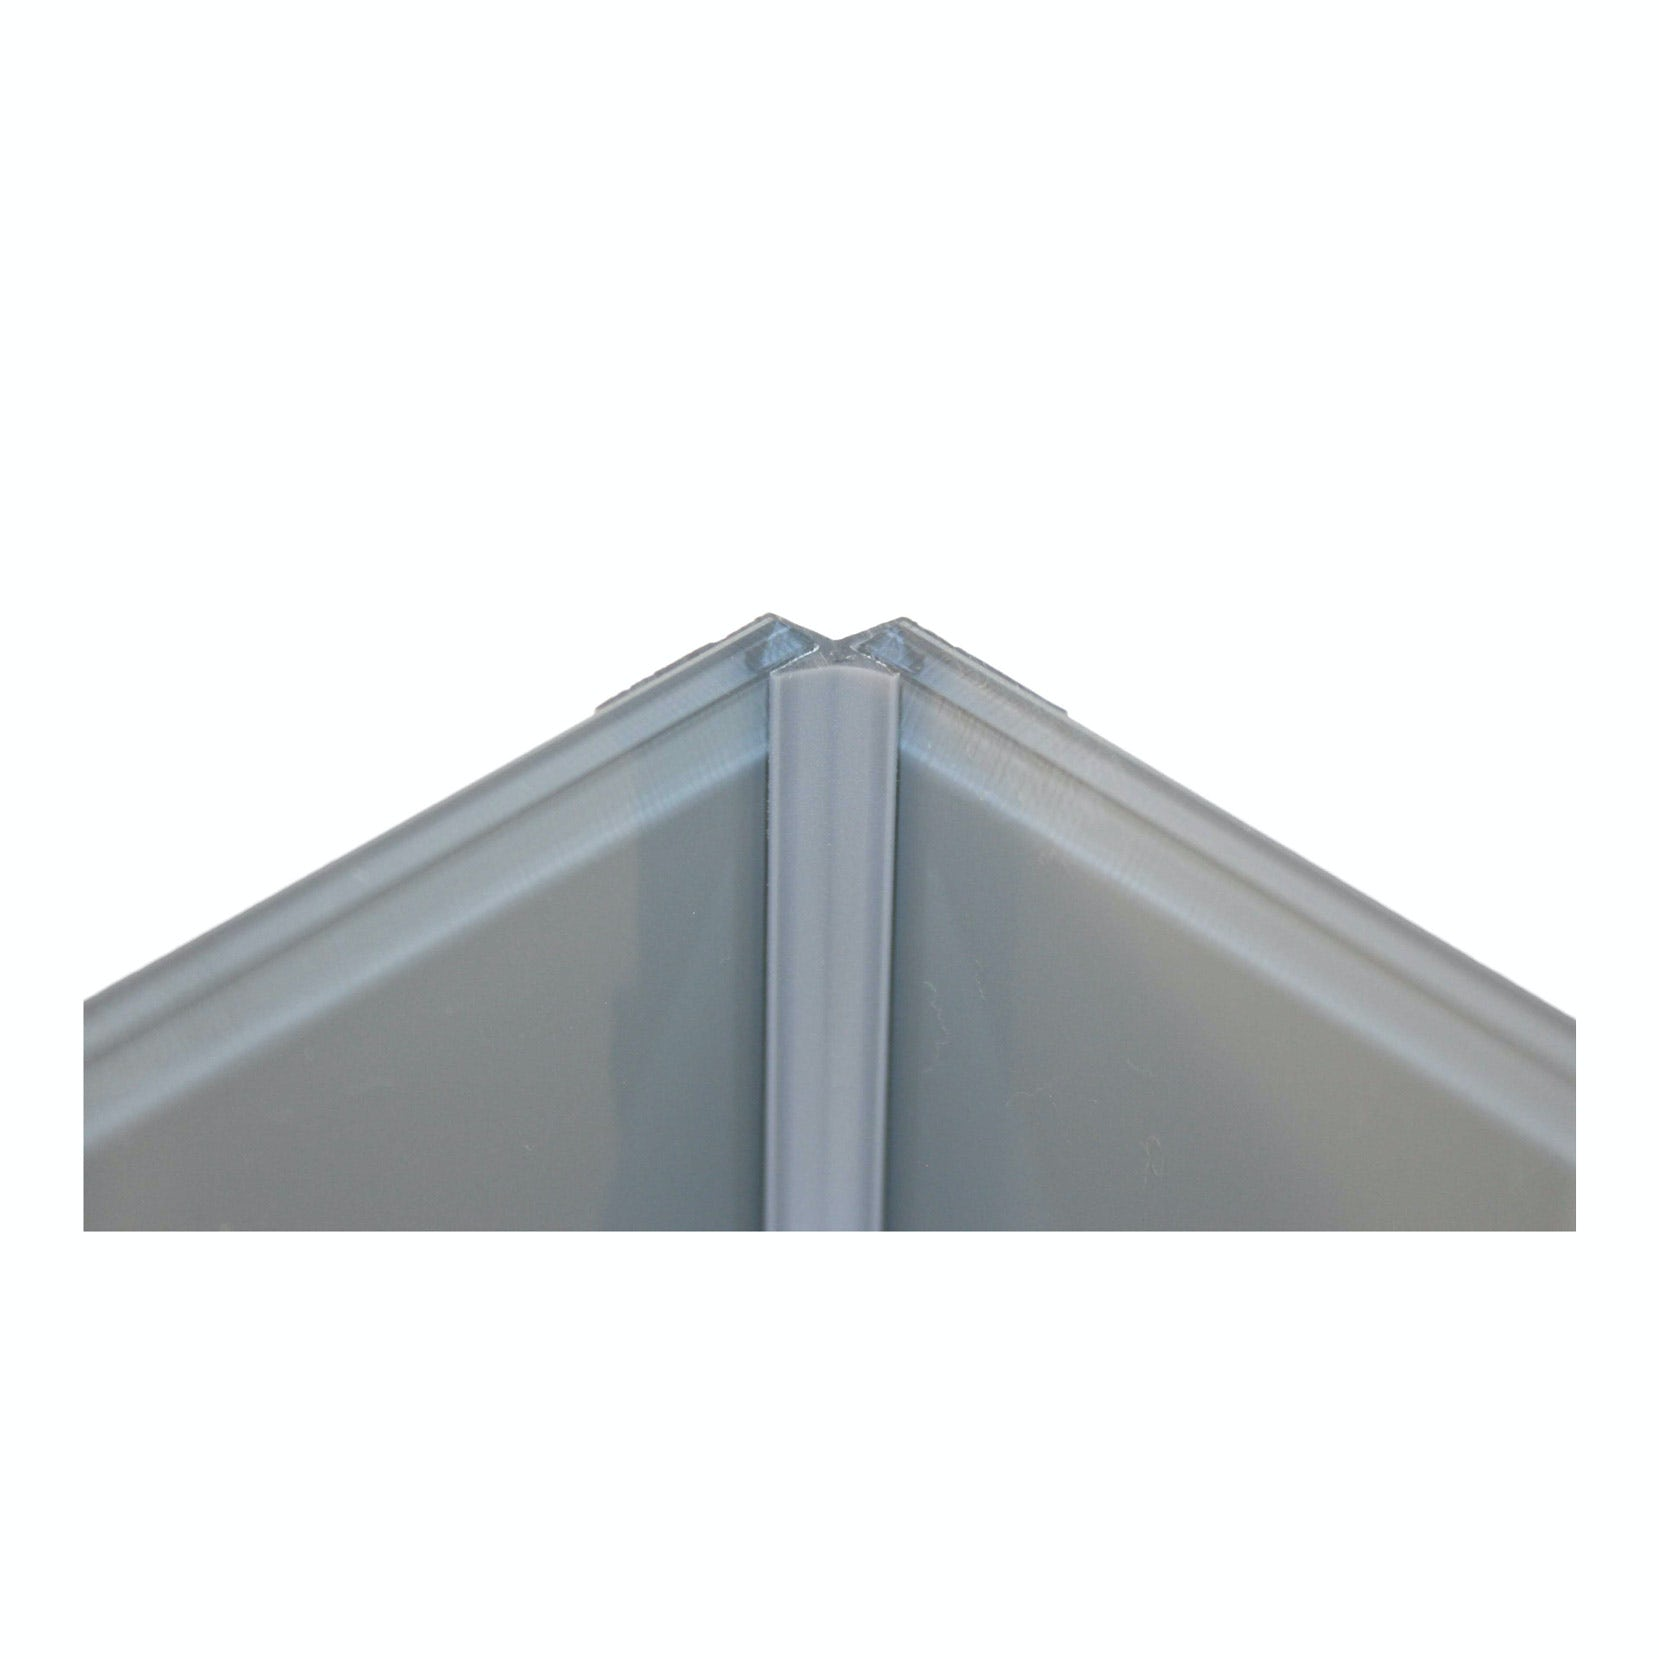 Zenolite plus matt ash colour matched internal corner joint 250mm